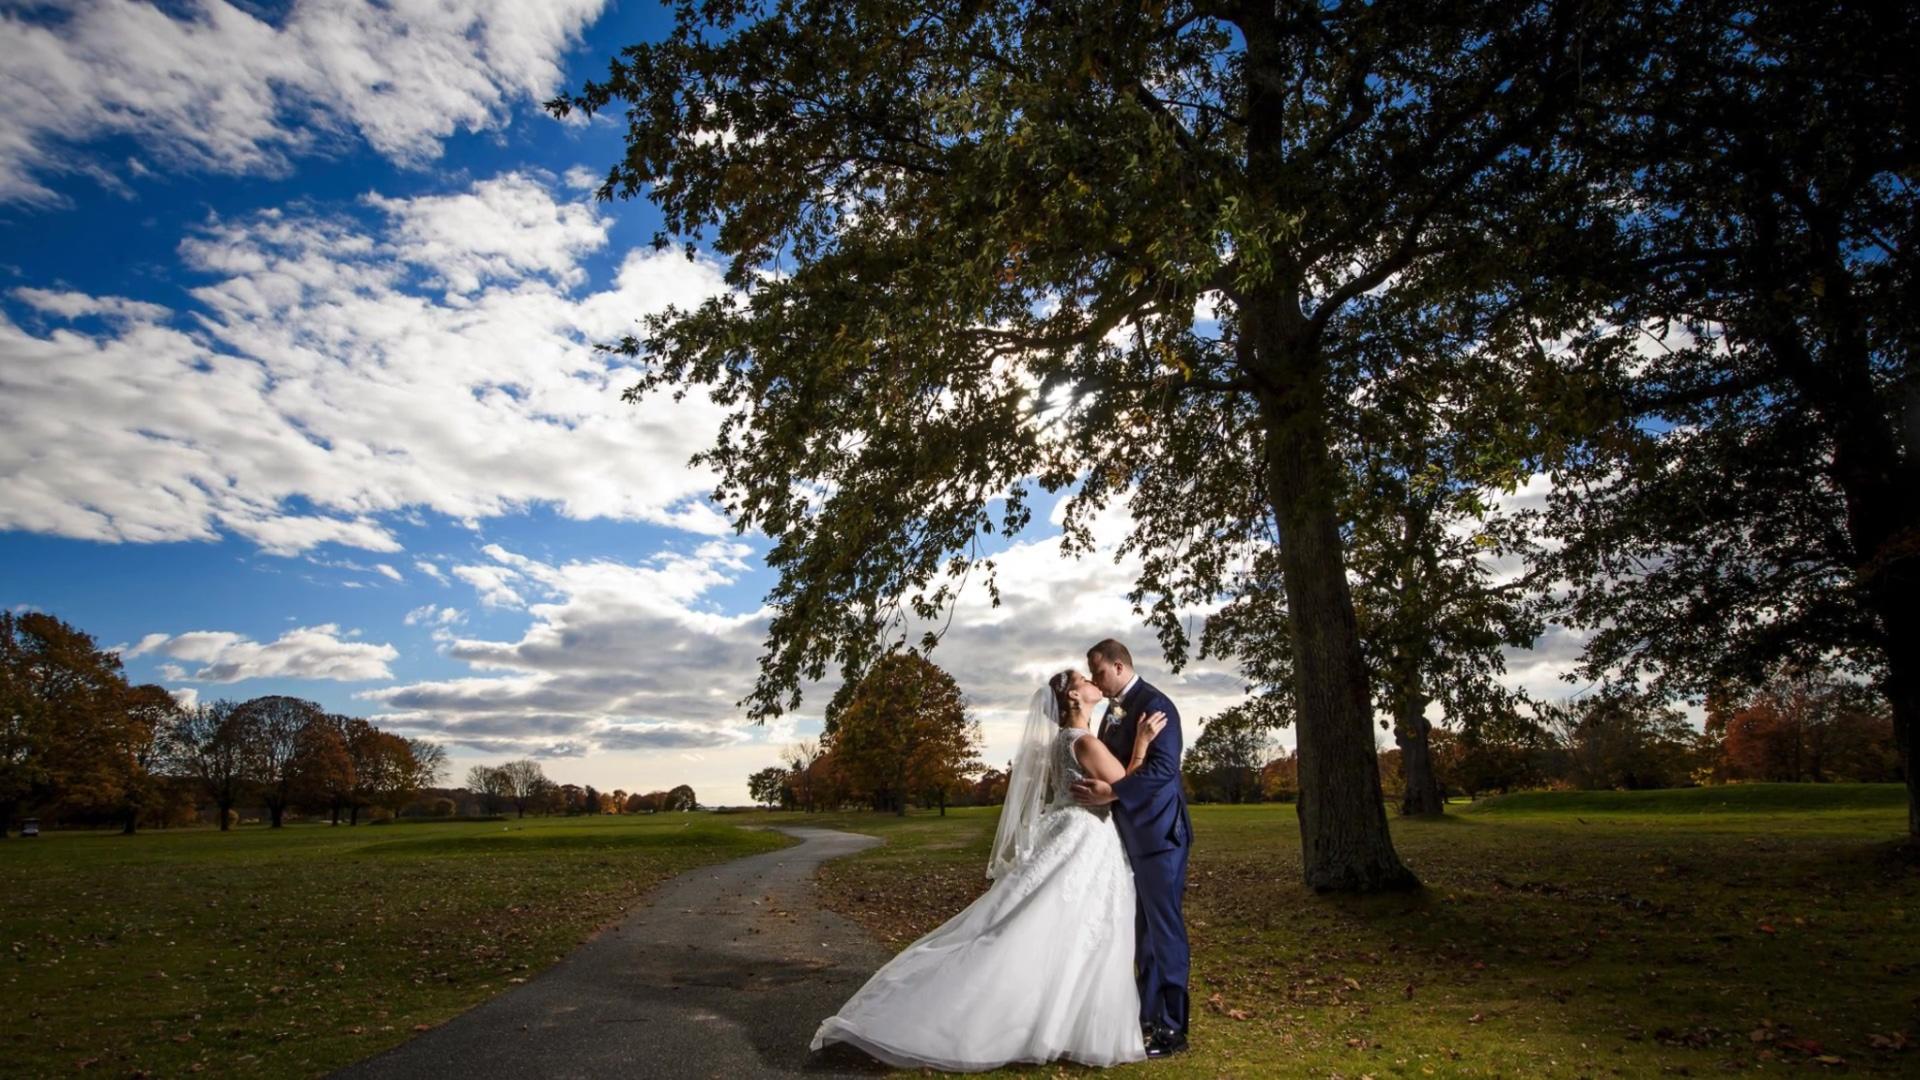 2020_Bellport_Country_Club_Wedding_Photos_1080p